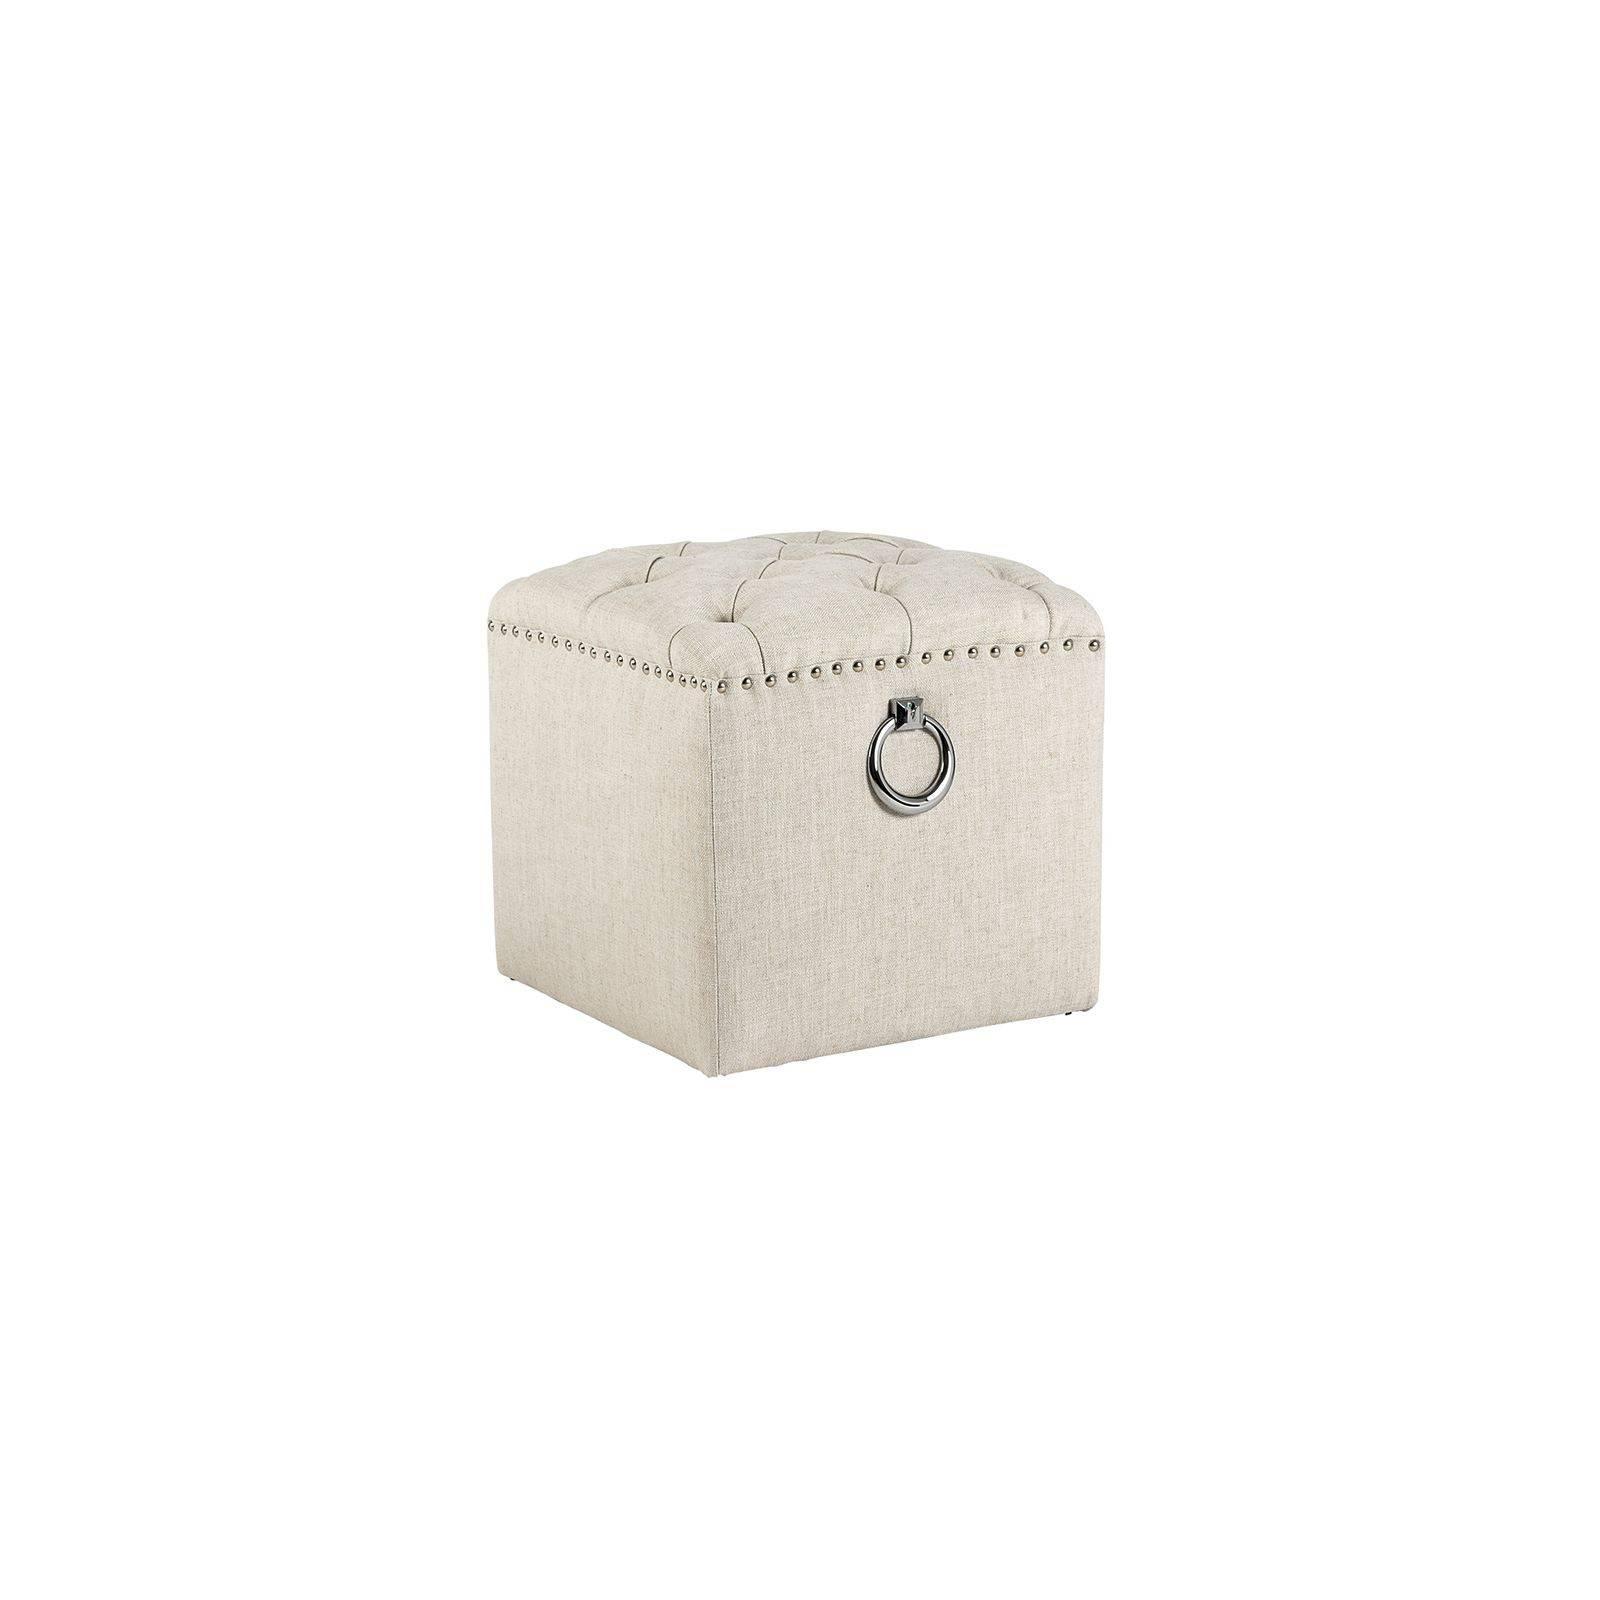 Repose-pieds Brooke Tissu - Achat meubles haut de gamme